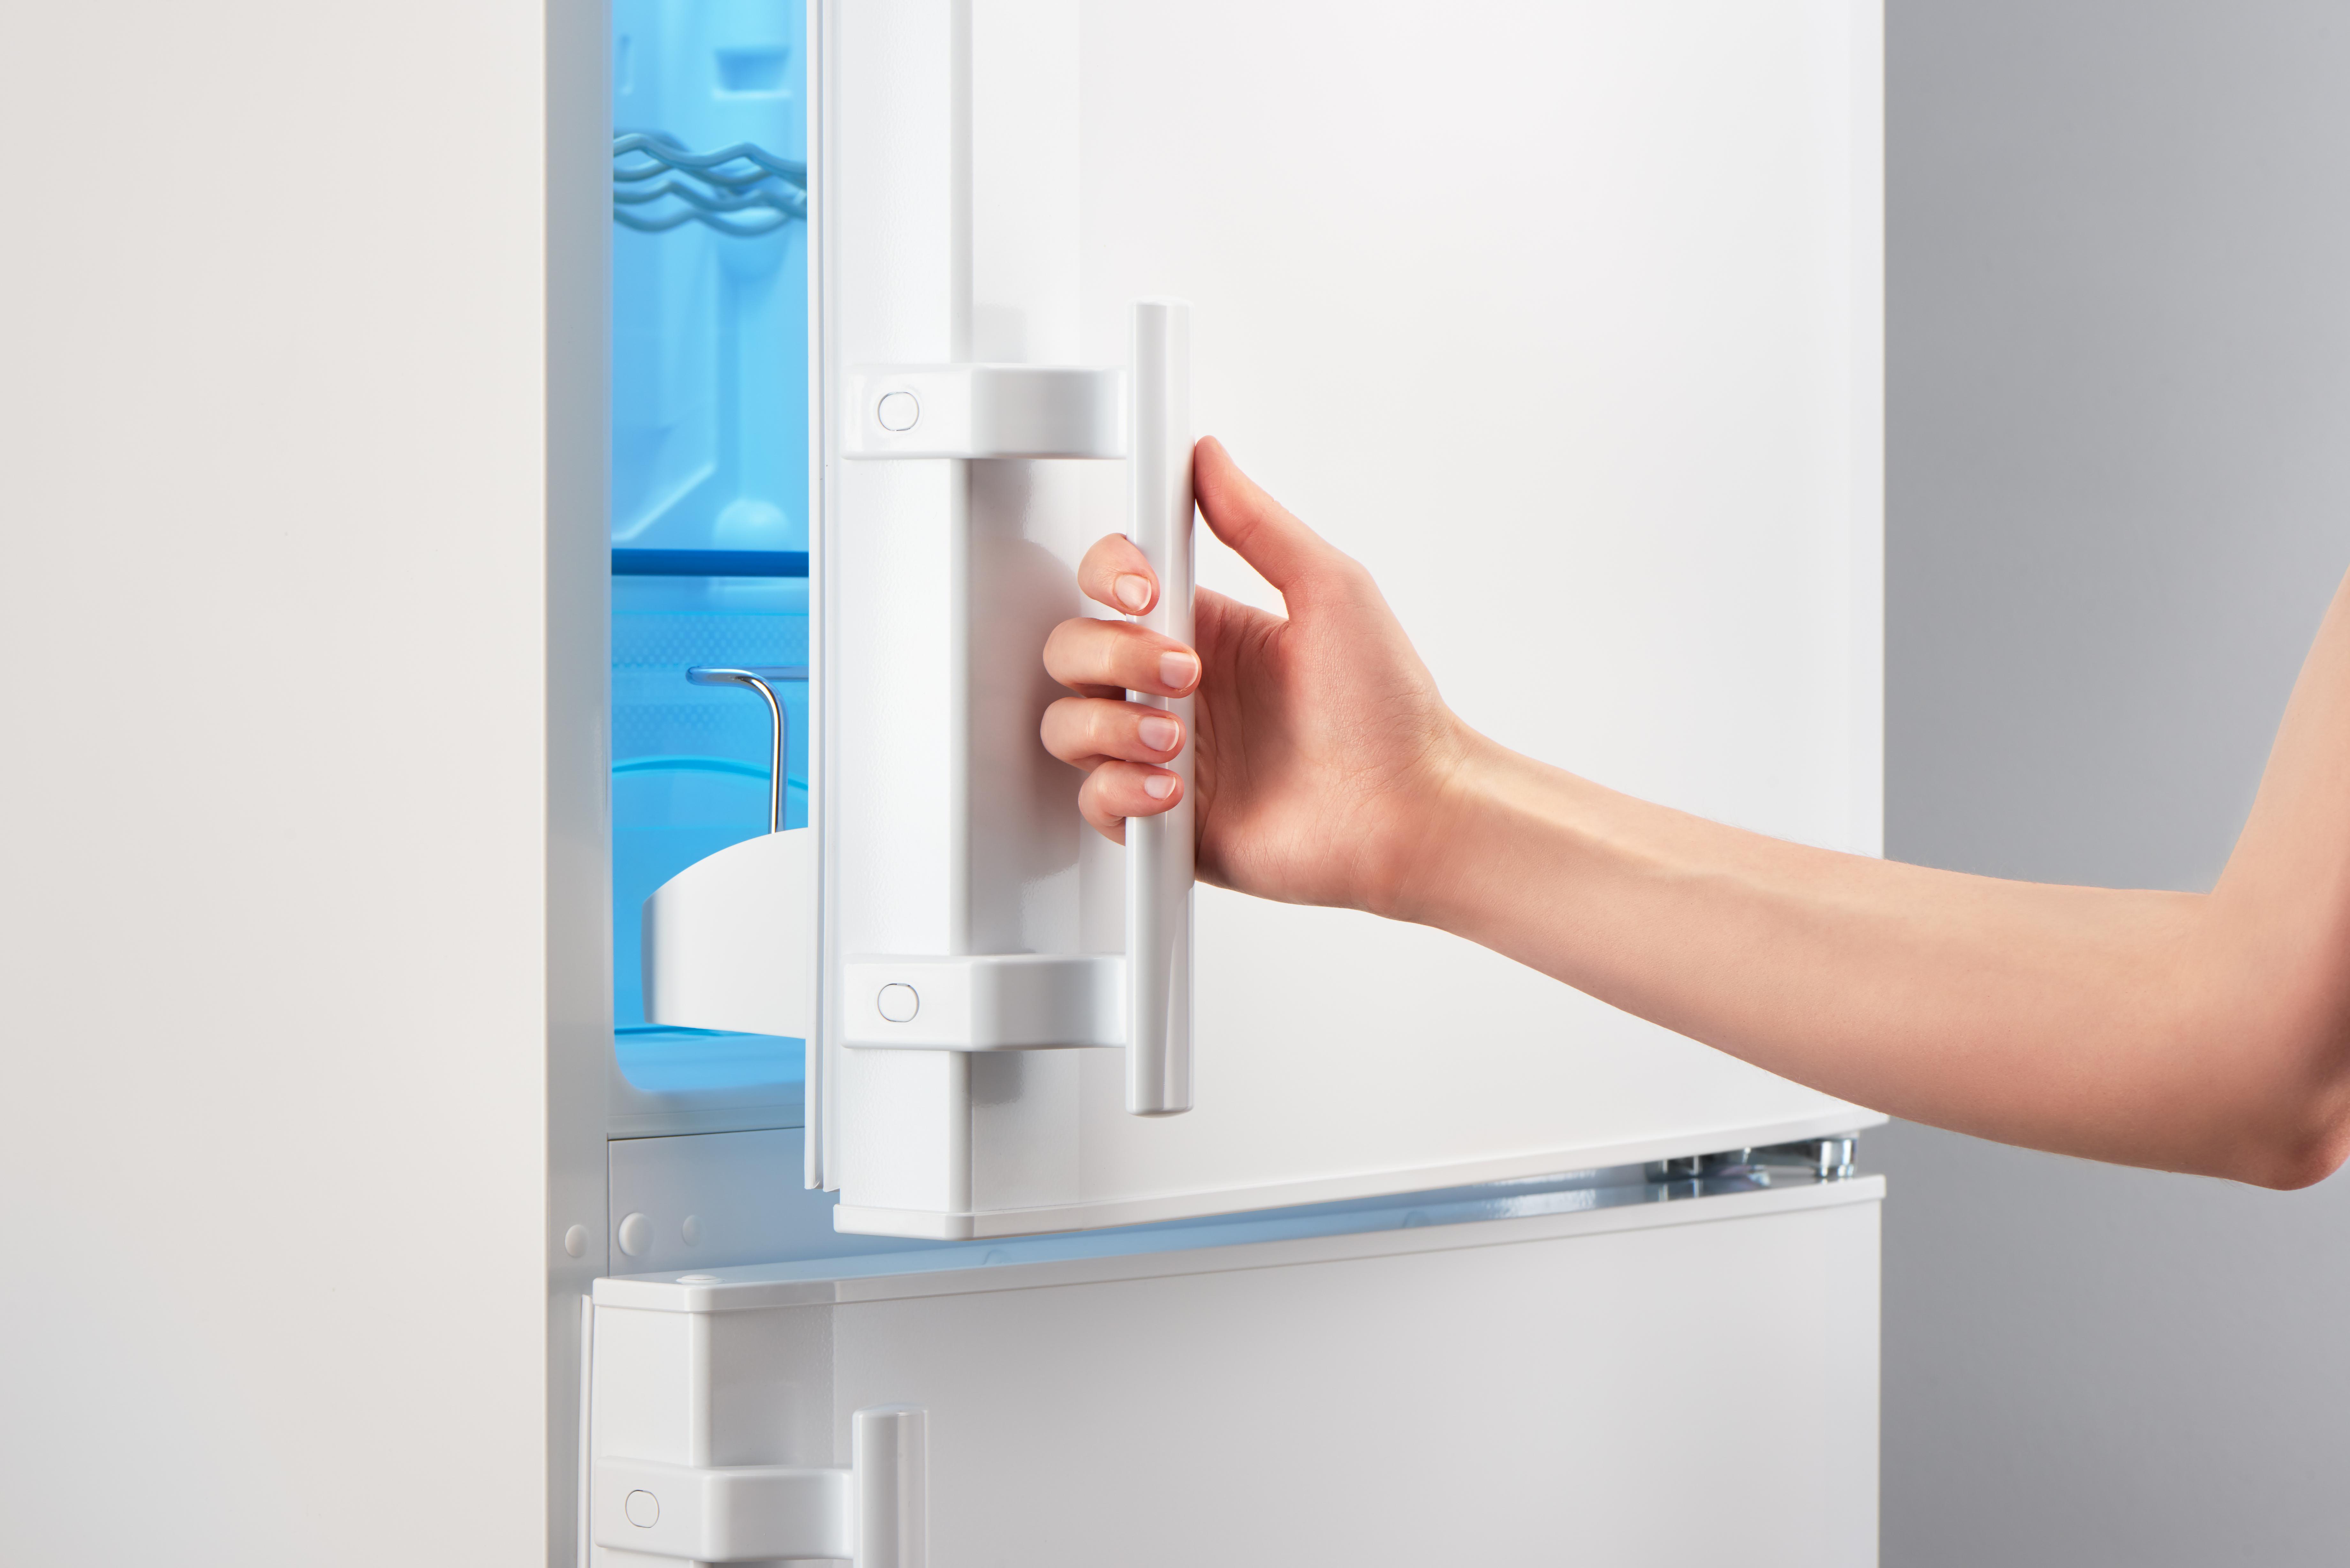 Freezer Defrost Wiring Diagram Walk In Freezer Not Going Into